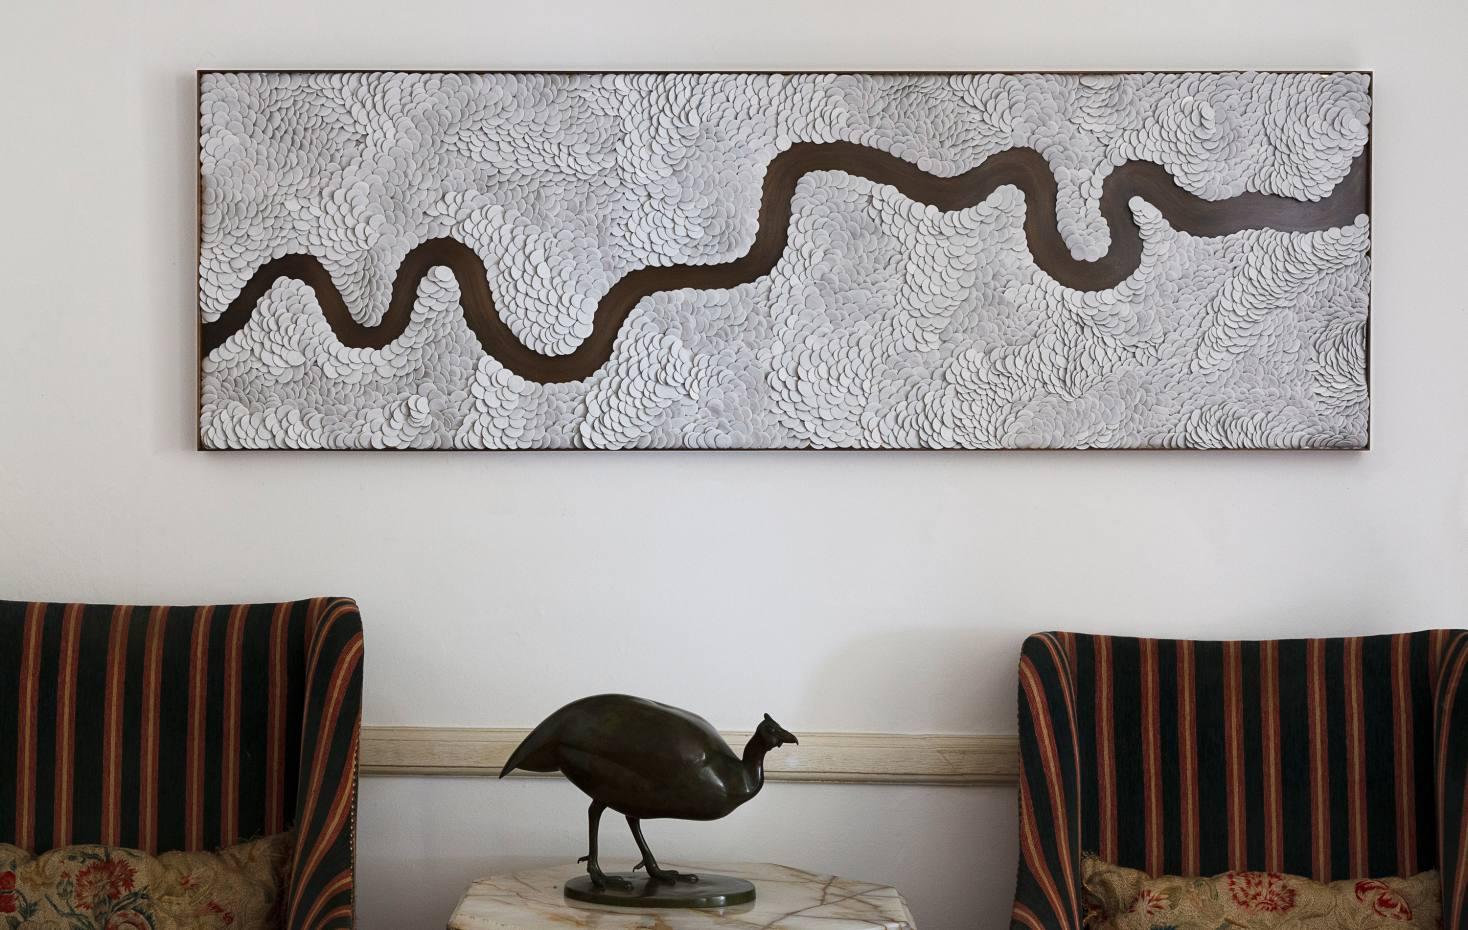 Fenella Elms' Thames Flow, from £7,000